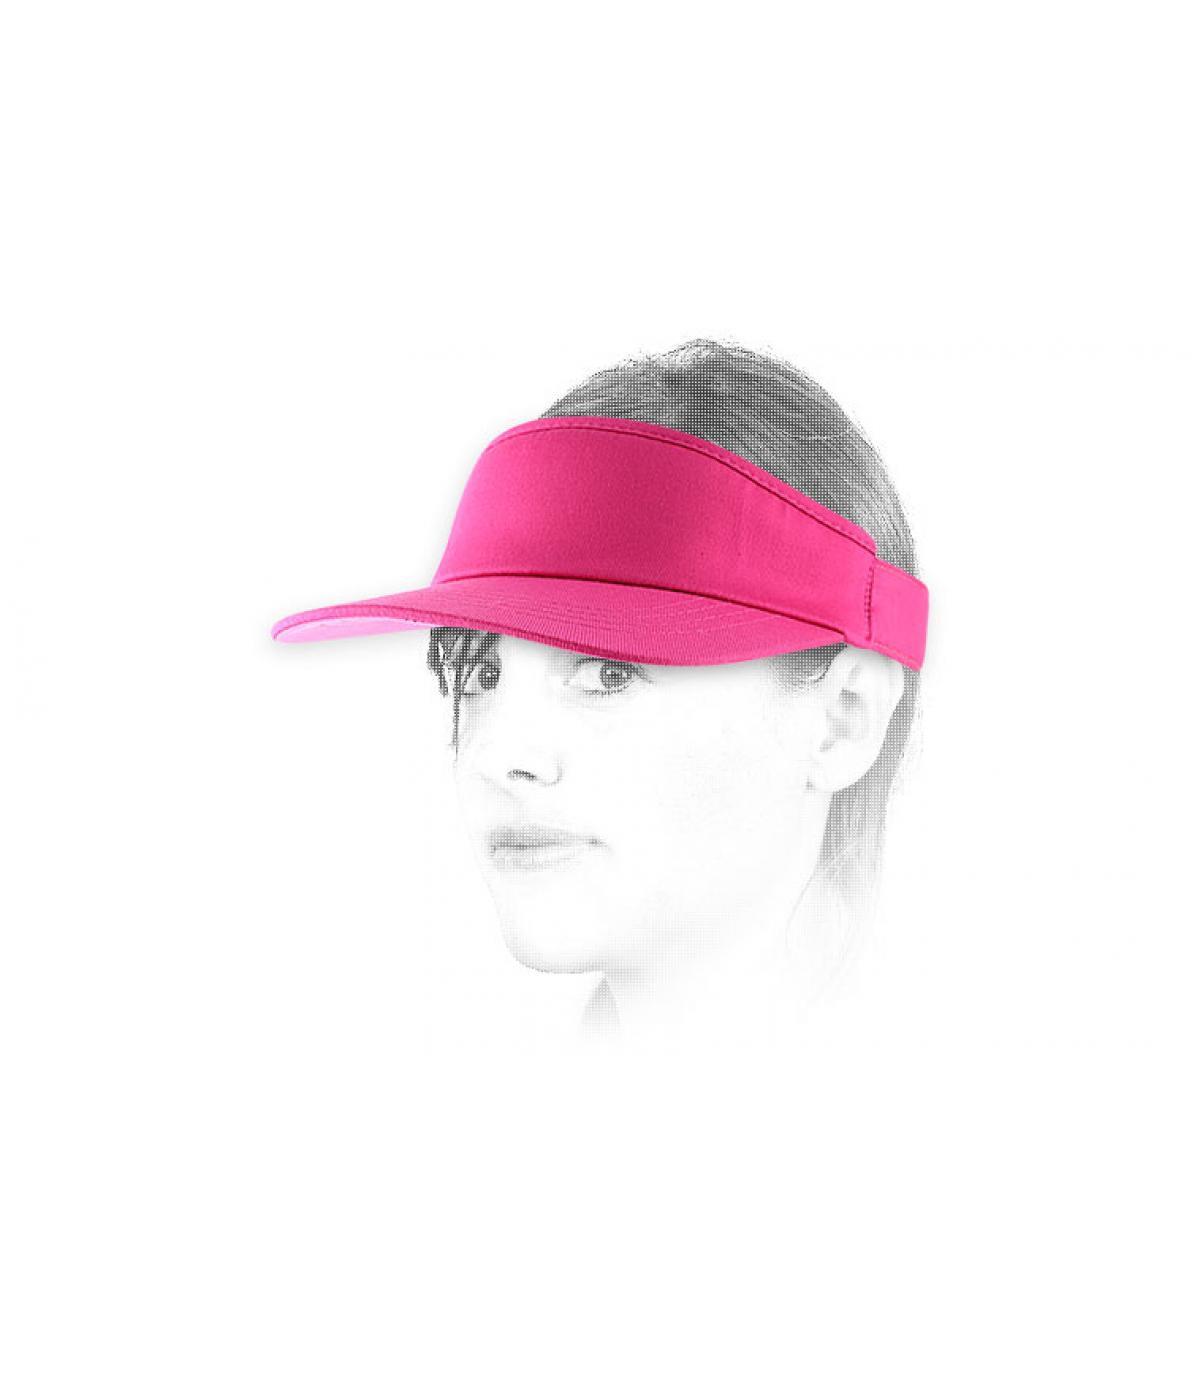 Visiera rosa flexfit wm